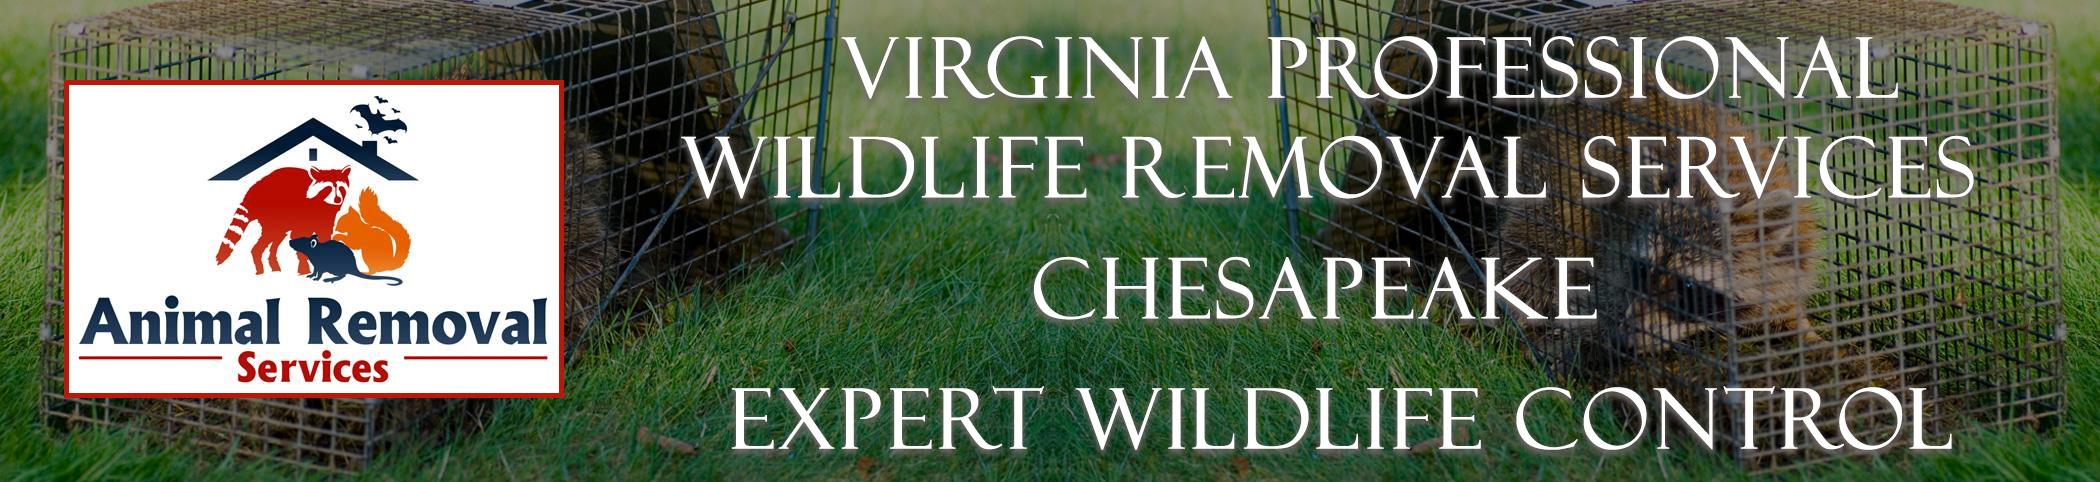 Virginia-Professional-Wildlife-Removal-Services-Chesapeake